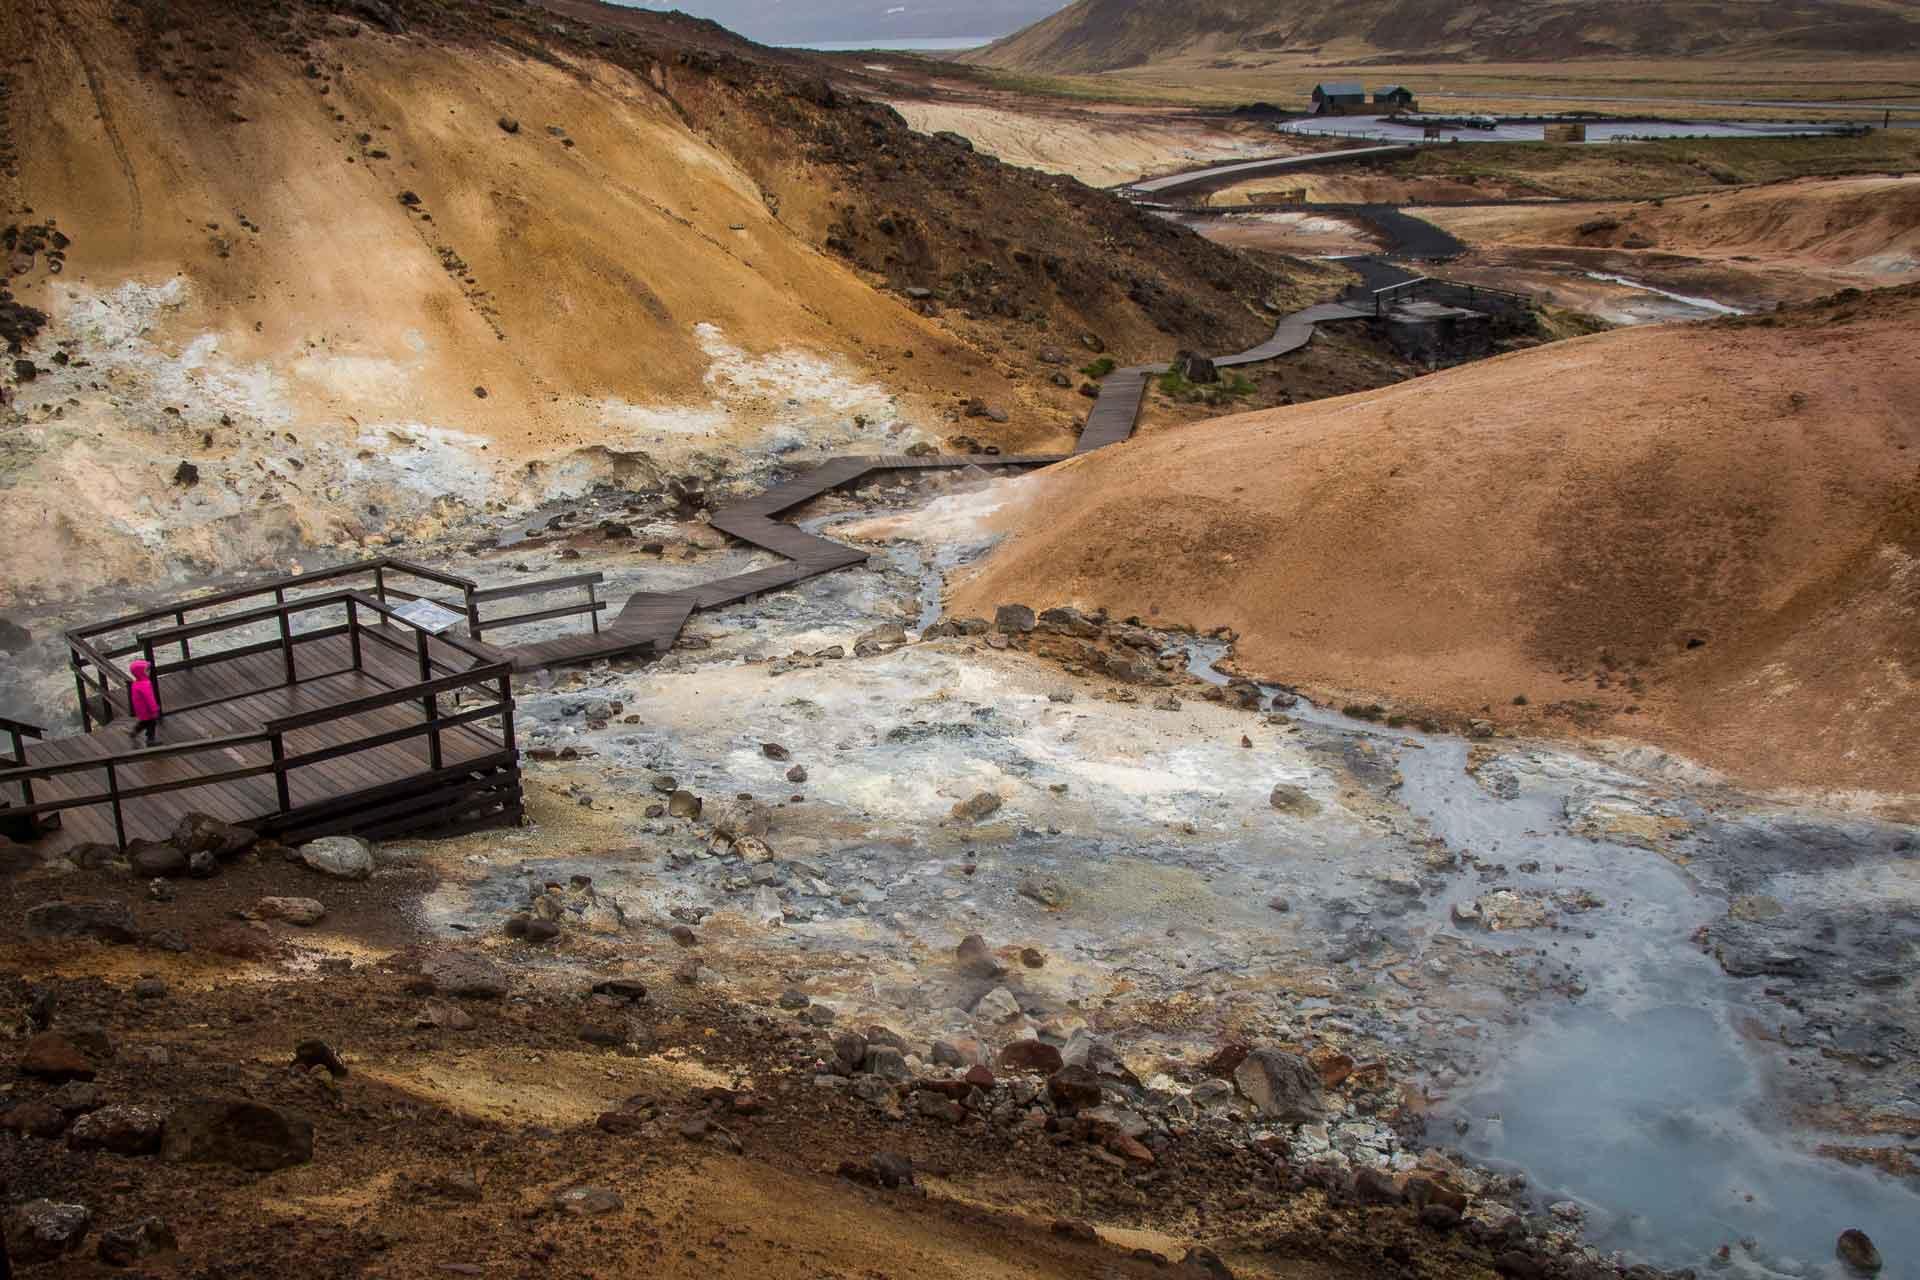 Krýsuvík geothermal field Reykjavik Iceland with kids